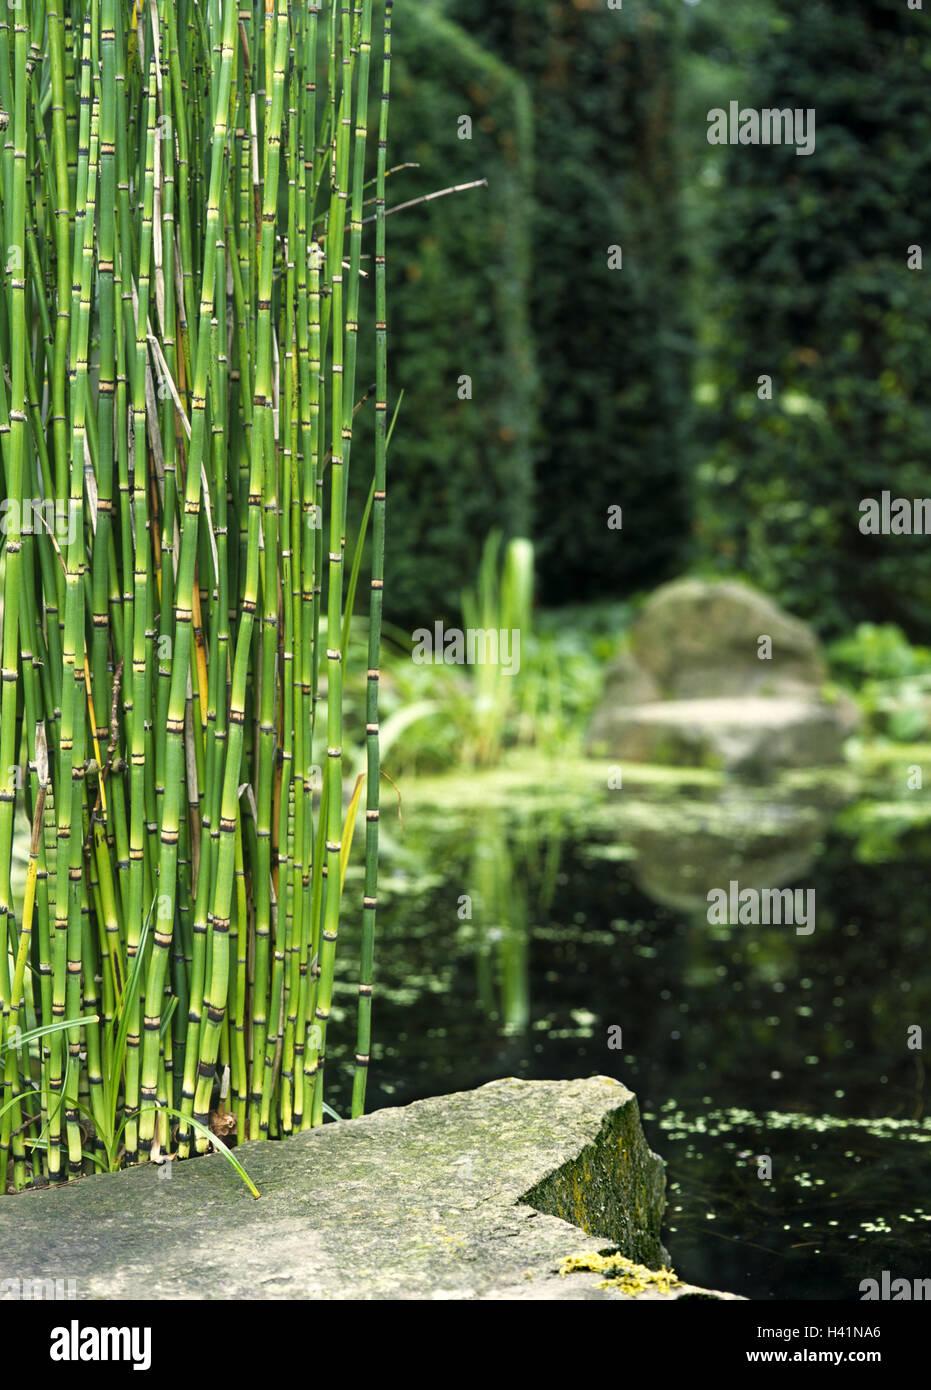 Japanischer Garten Teich Bambus Park Garten Garten Wasser Ufer